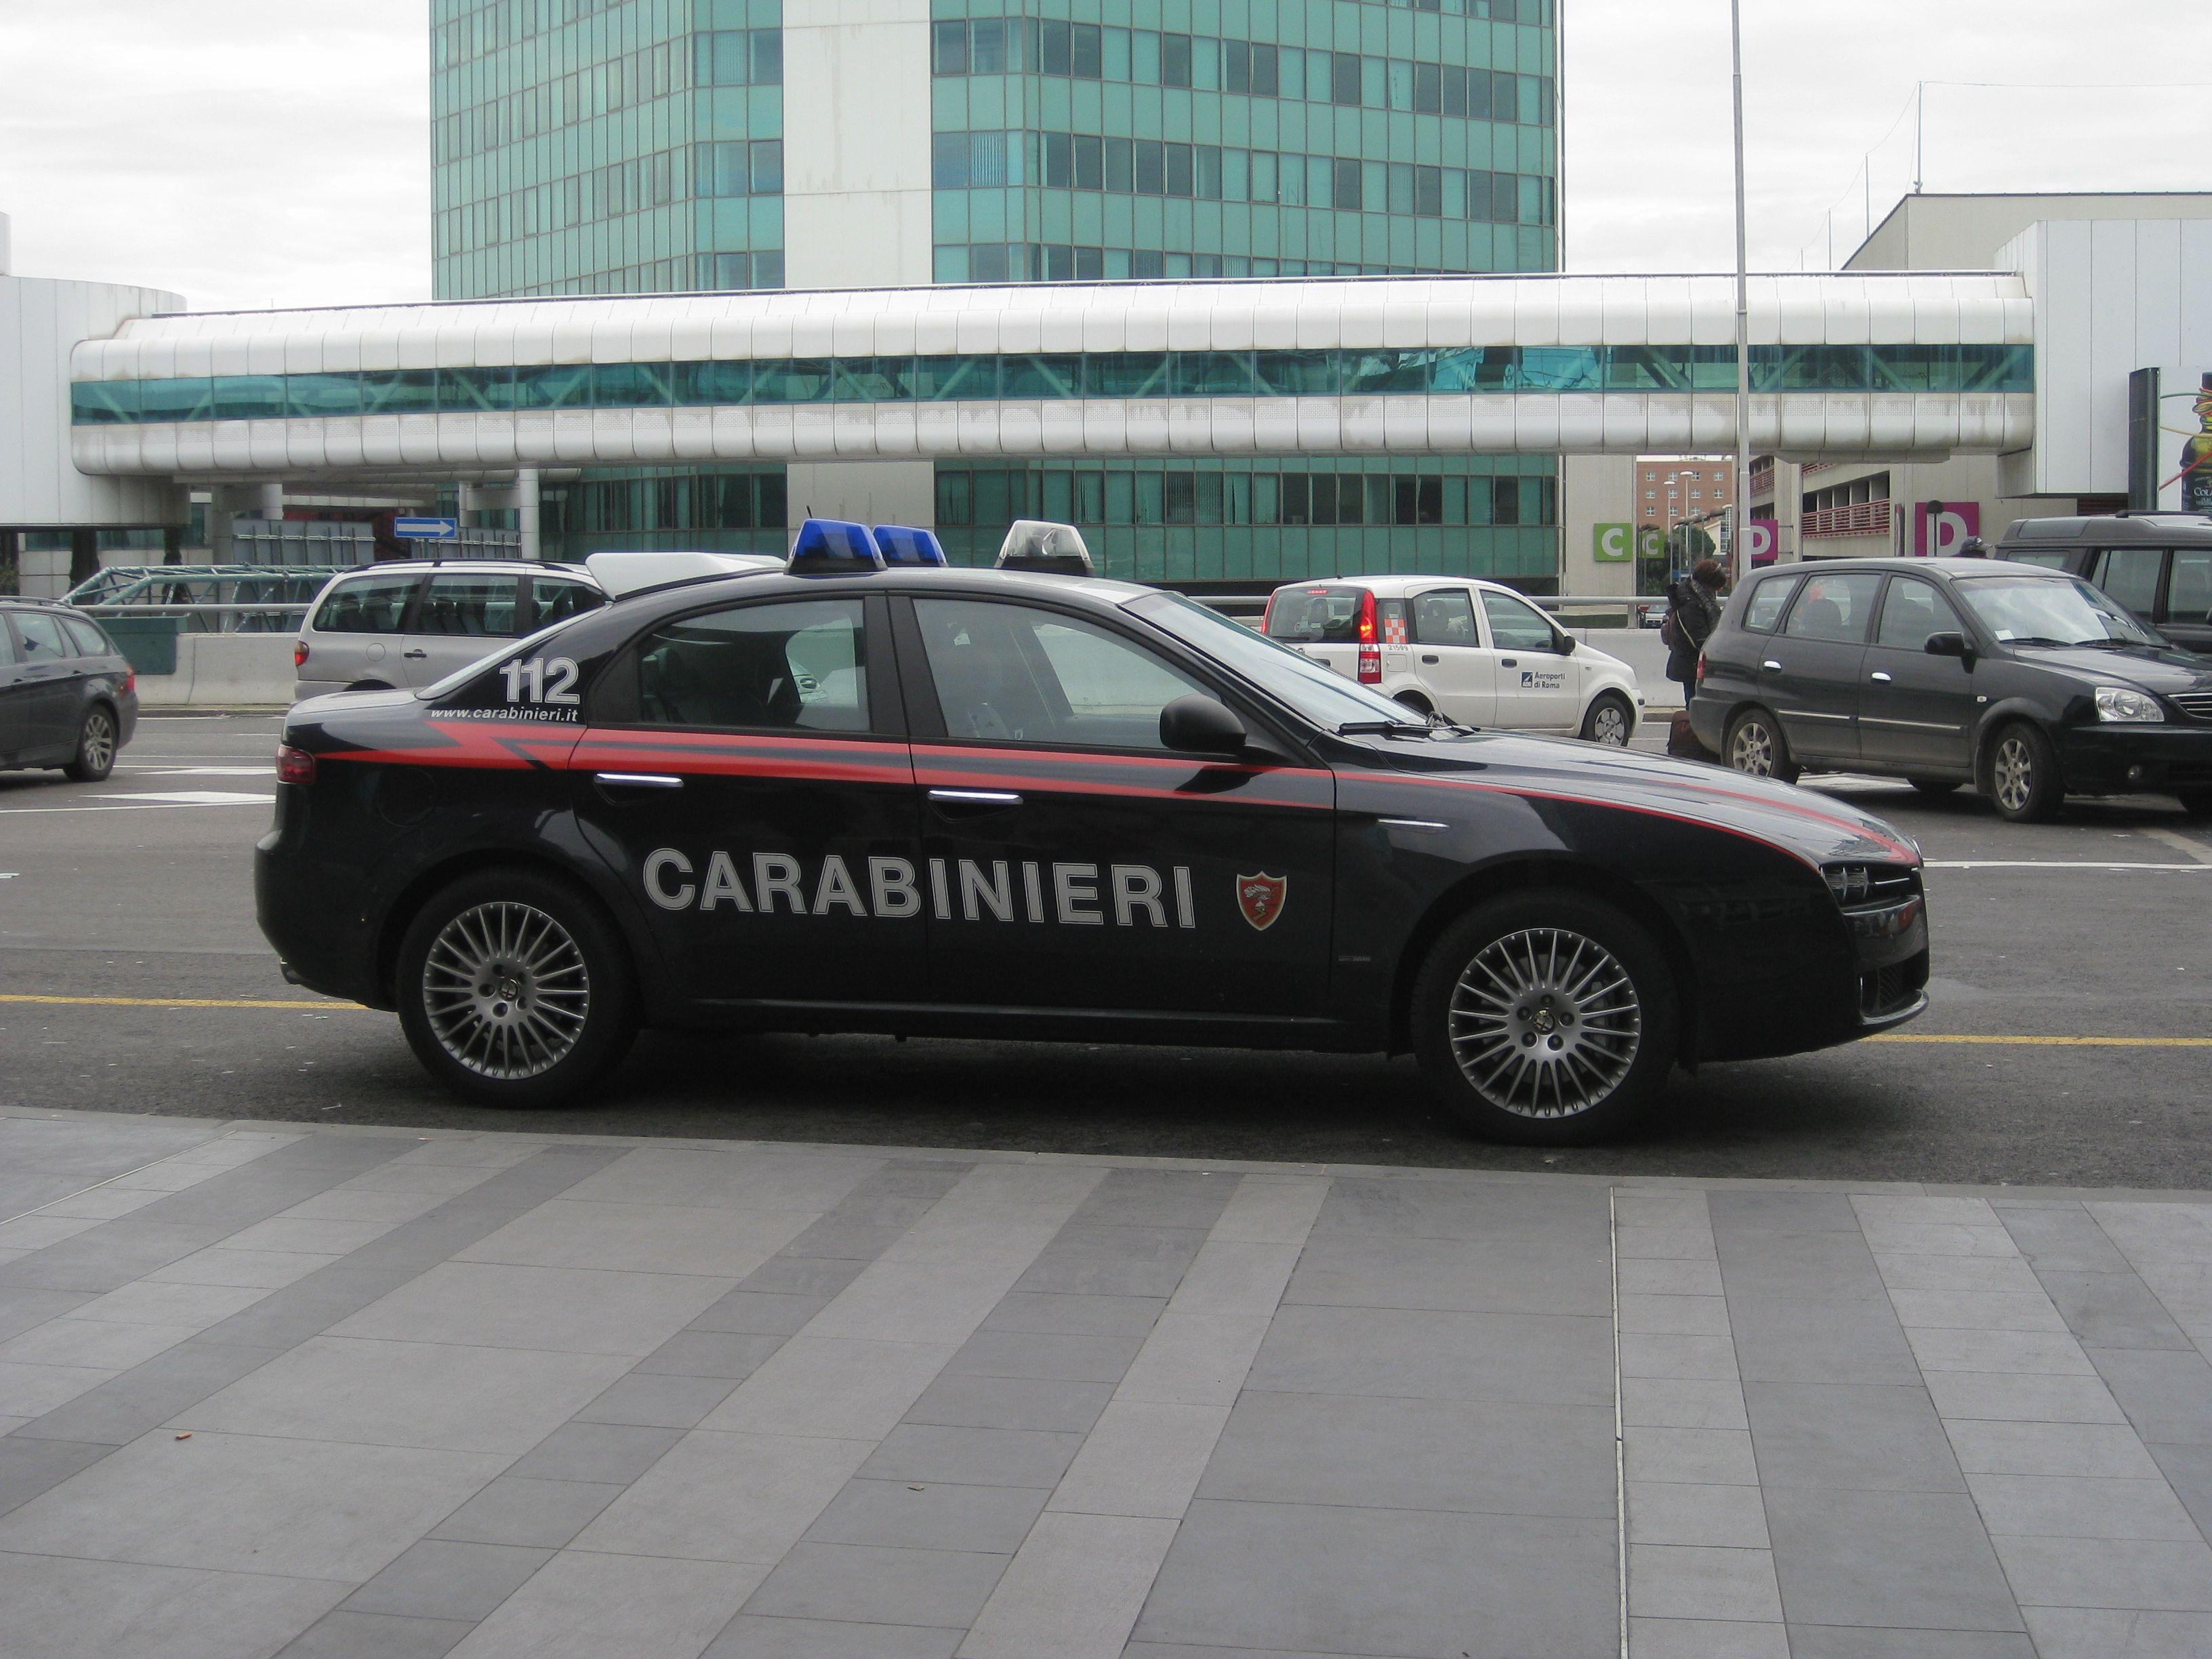 Andria 50 milioni di euro sequestrati a ex rapitore